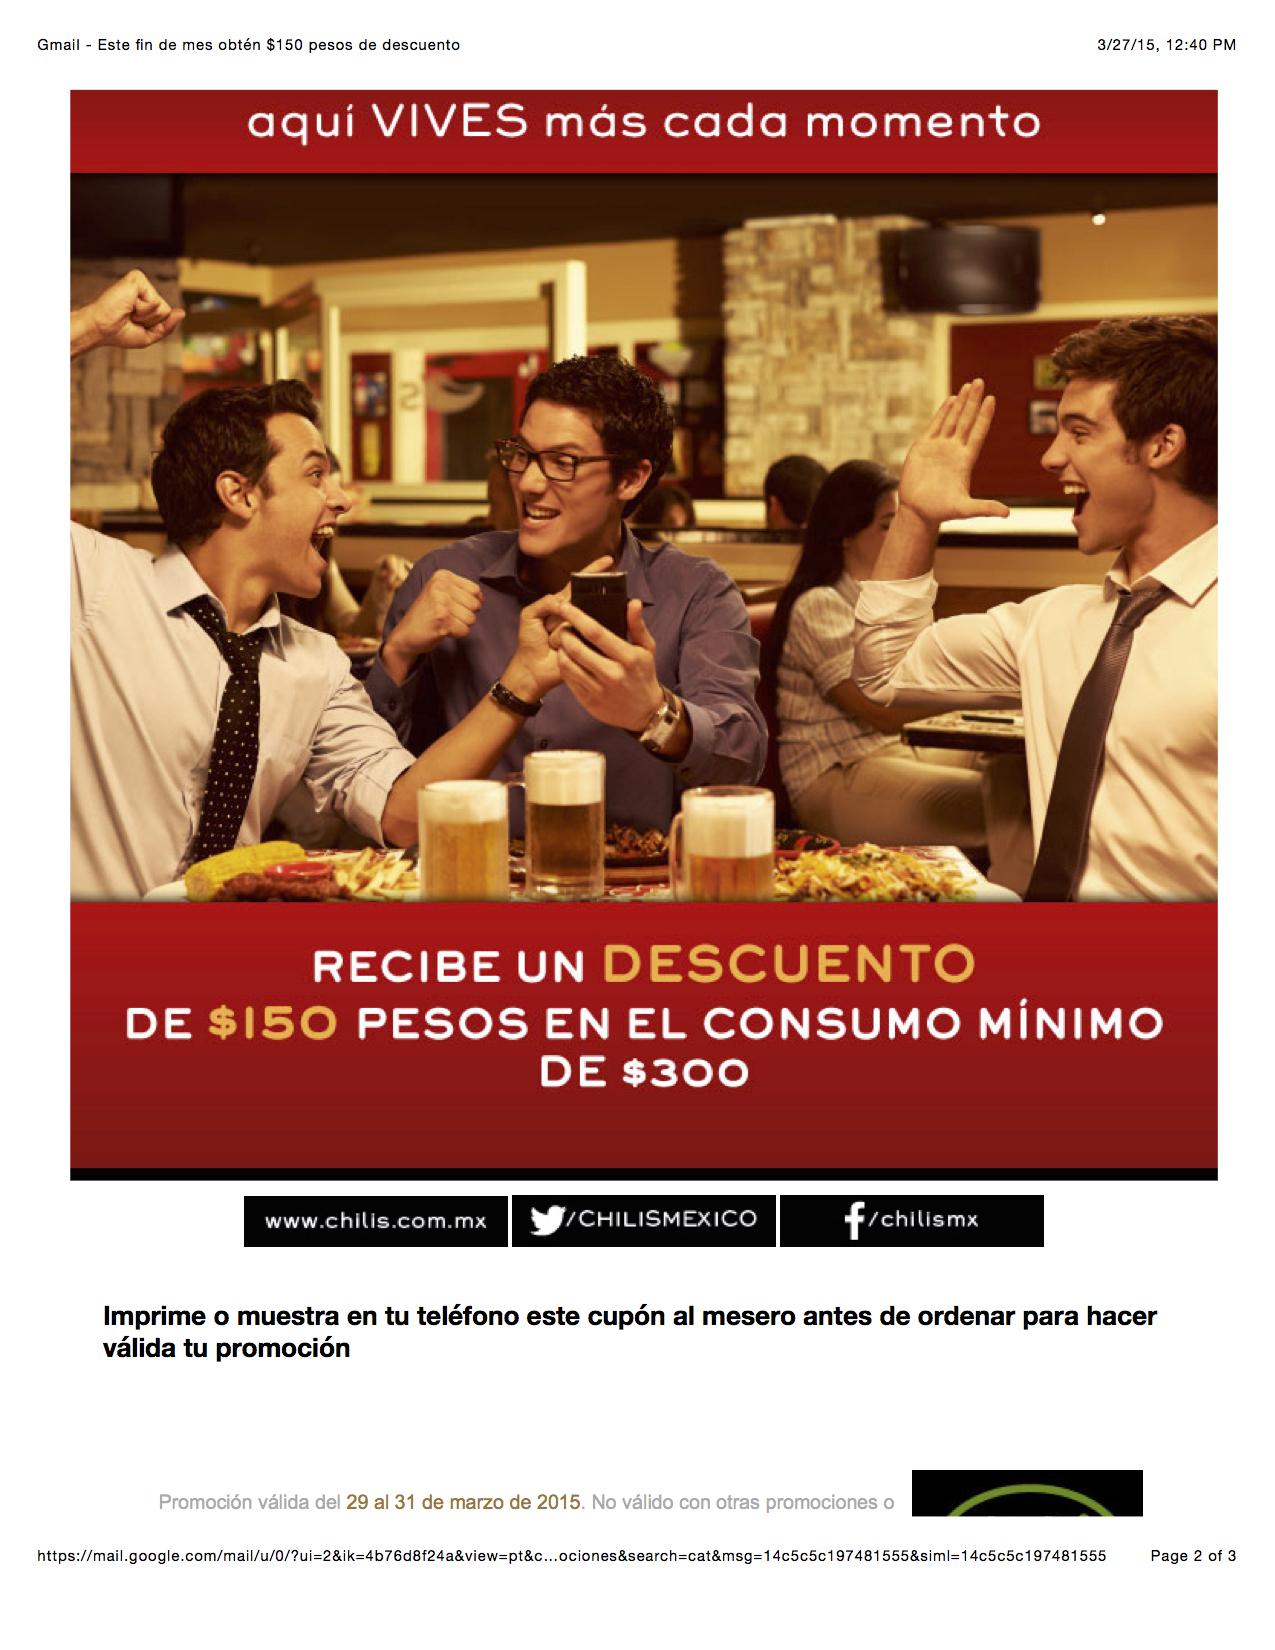 Chili's: Este fin de mes obtén $150.00 pesos de descuento en consumo mínimo de $300.00